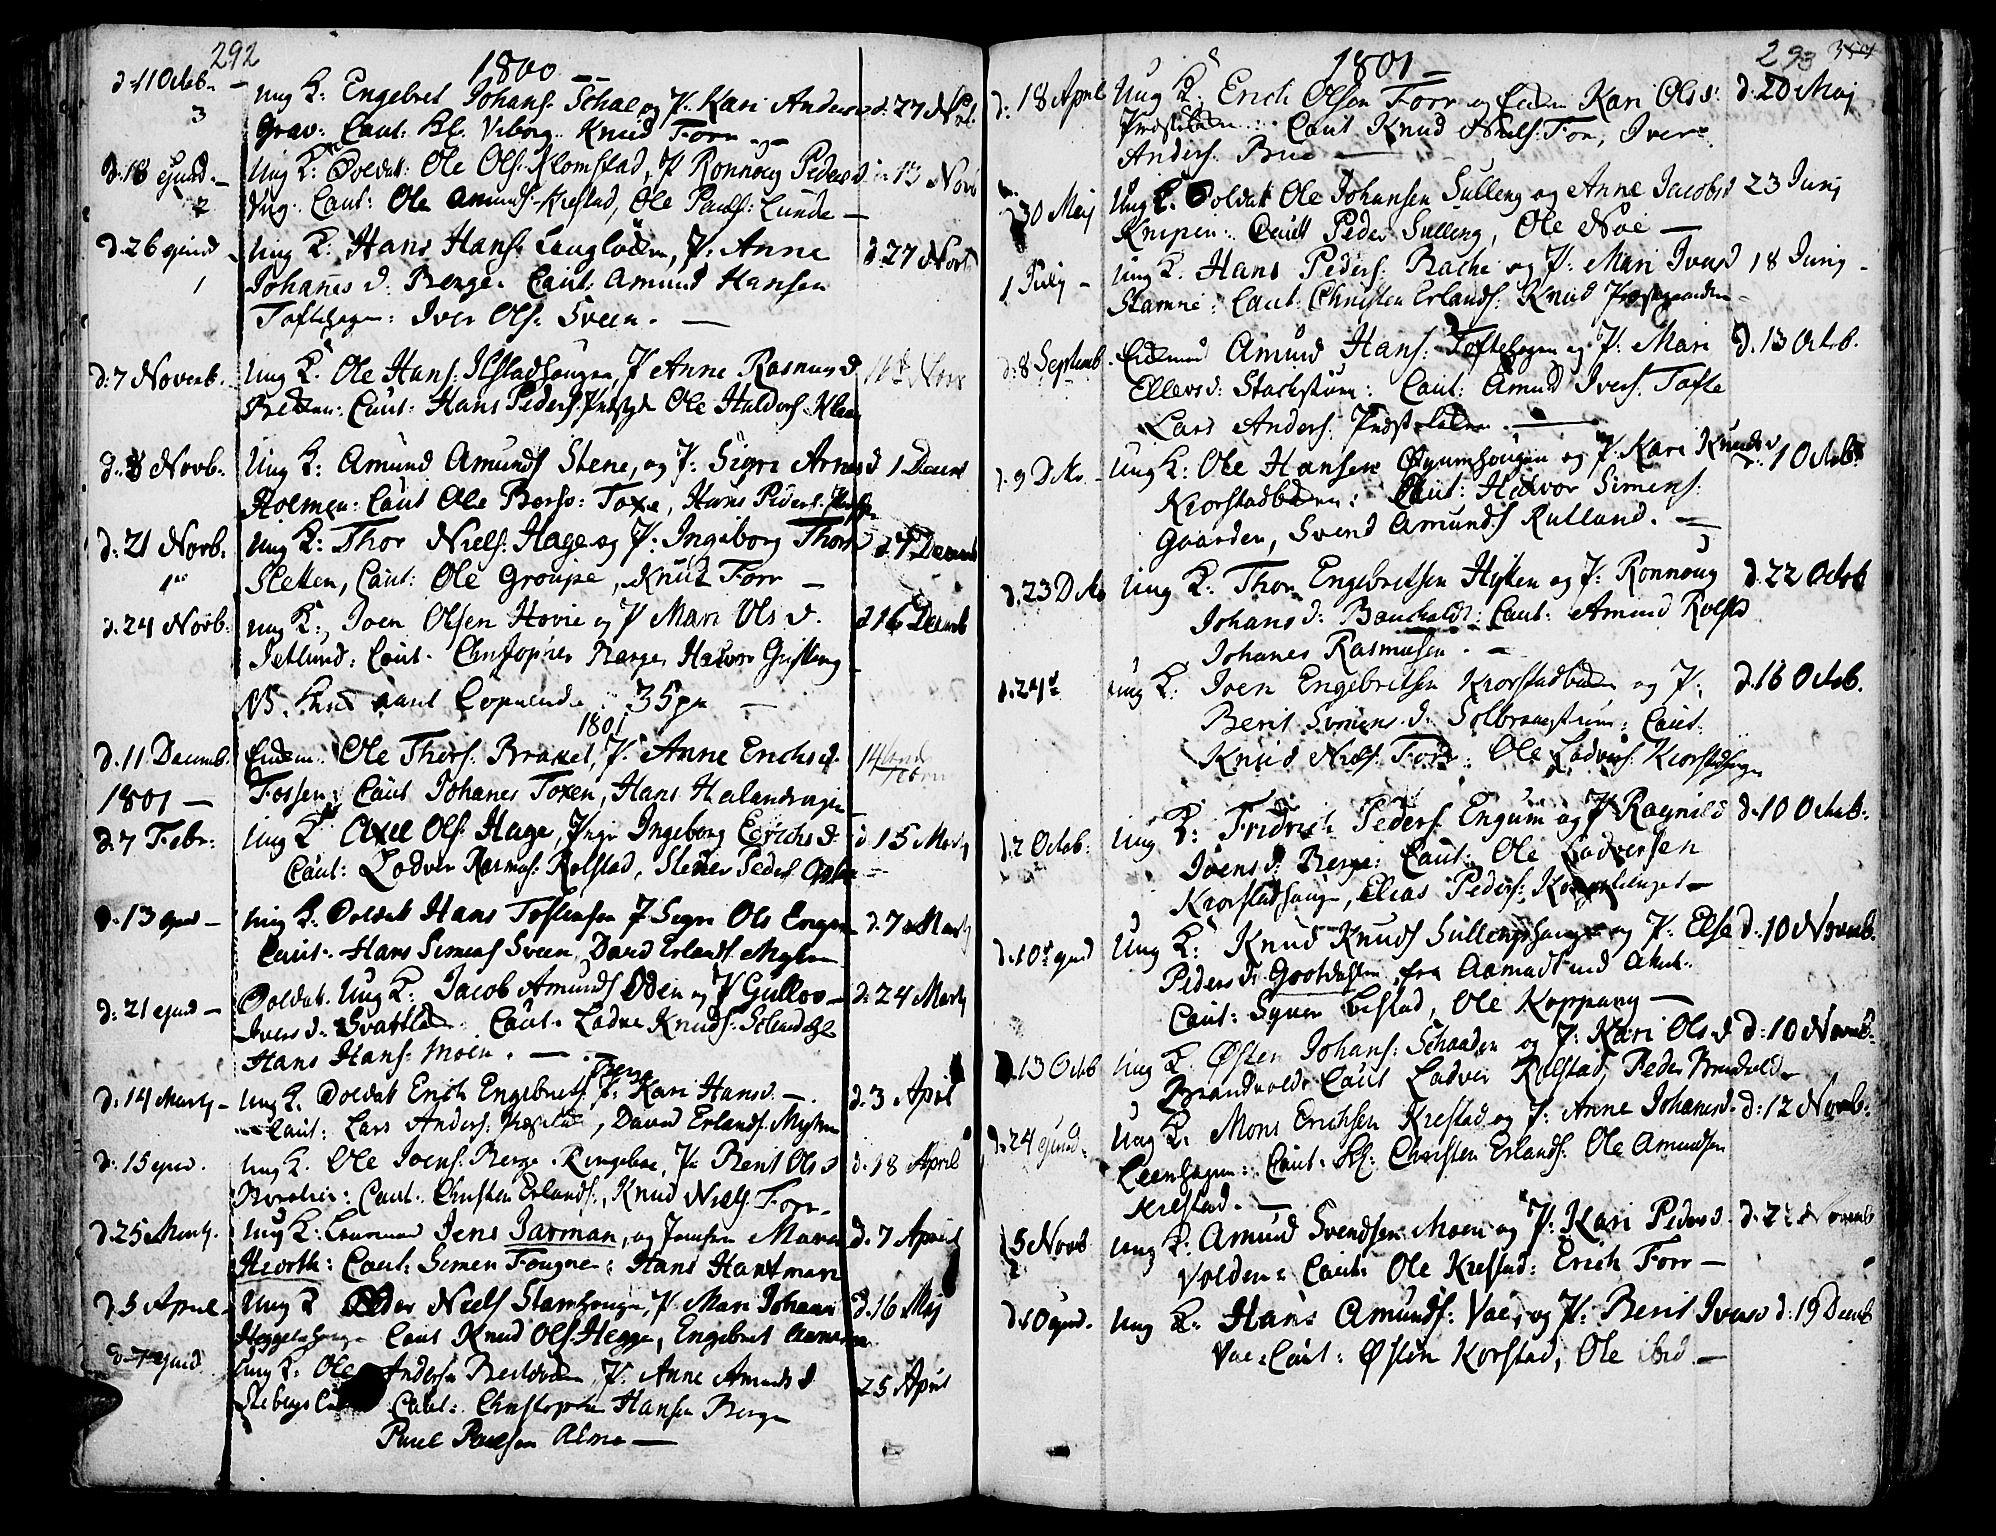 SAH, Fron prestekontor, H/Ha/Haa/L0001: Ministerialbok nr. 1, 1799-1816, s. 292-293